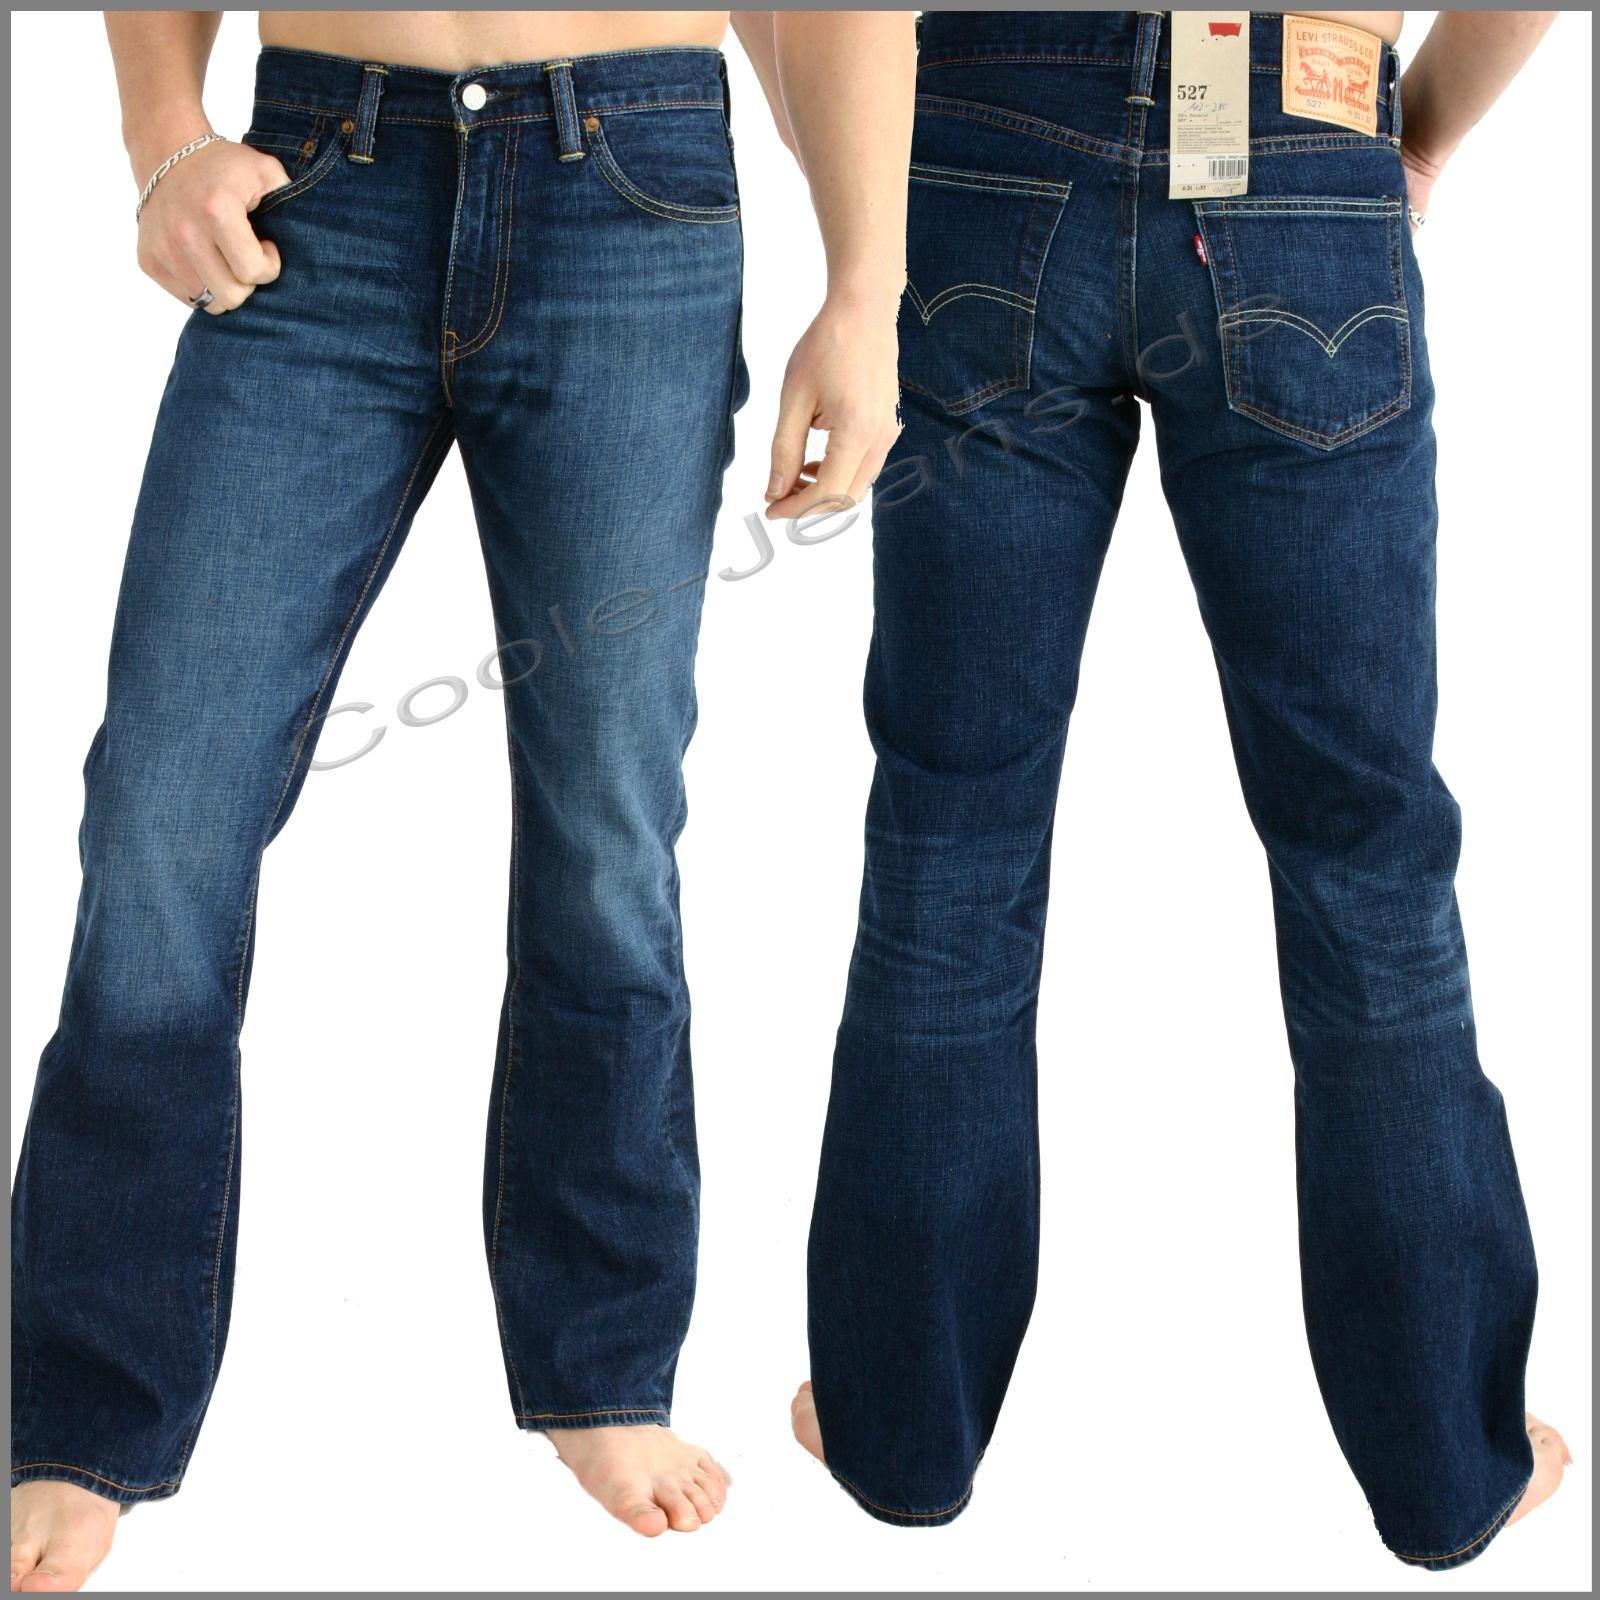 levis bootcut 512 herren super jeans in dieser saison. Black Bedroom Furniture Sets. Home Design Ideas